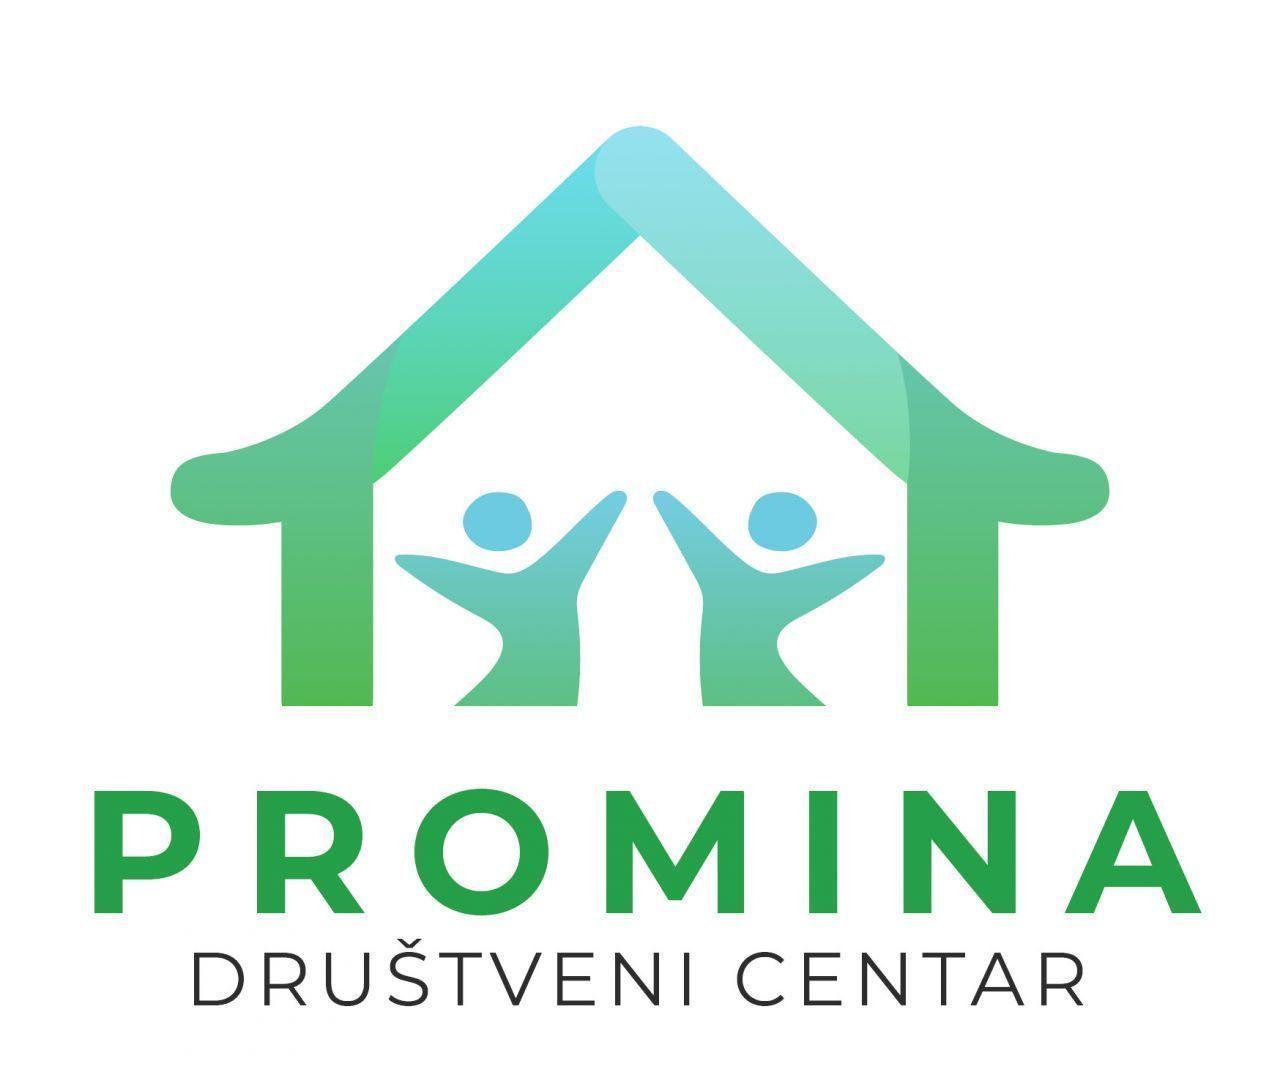 Društveni centar Promina - kalendar događanja za 06/2021.